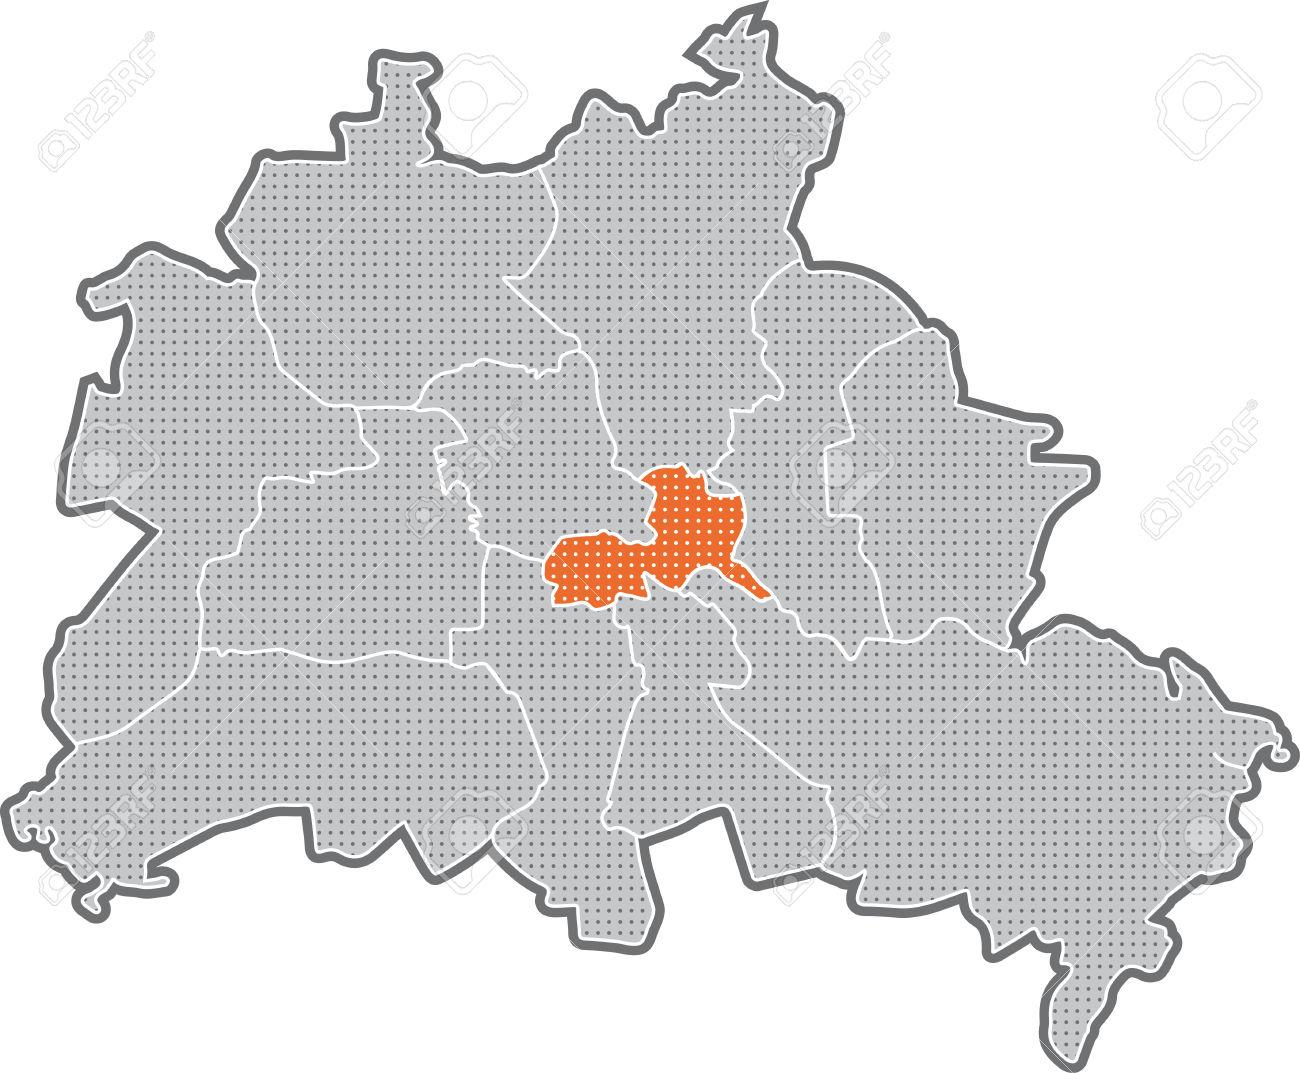 Map Of Berlin, Focus On District Friedrichshain Kreuzberg Stock.